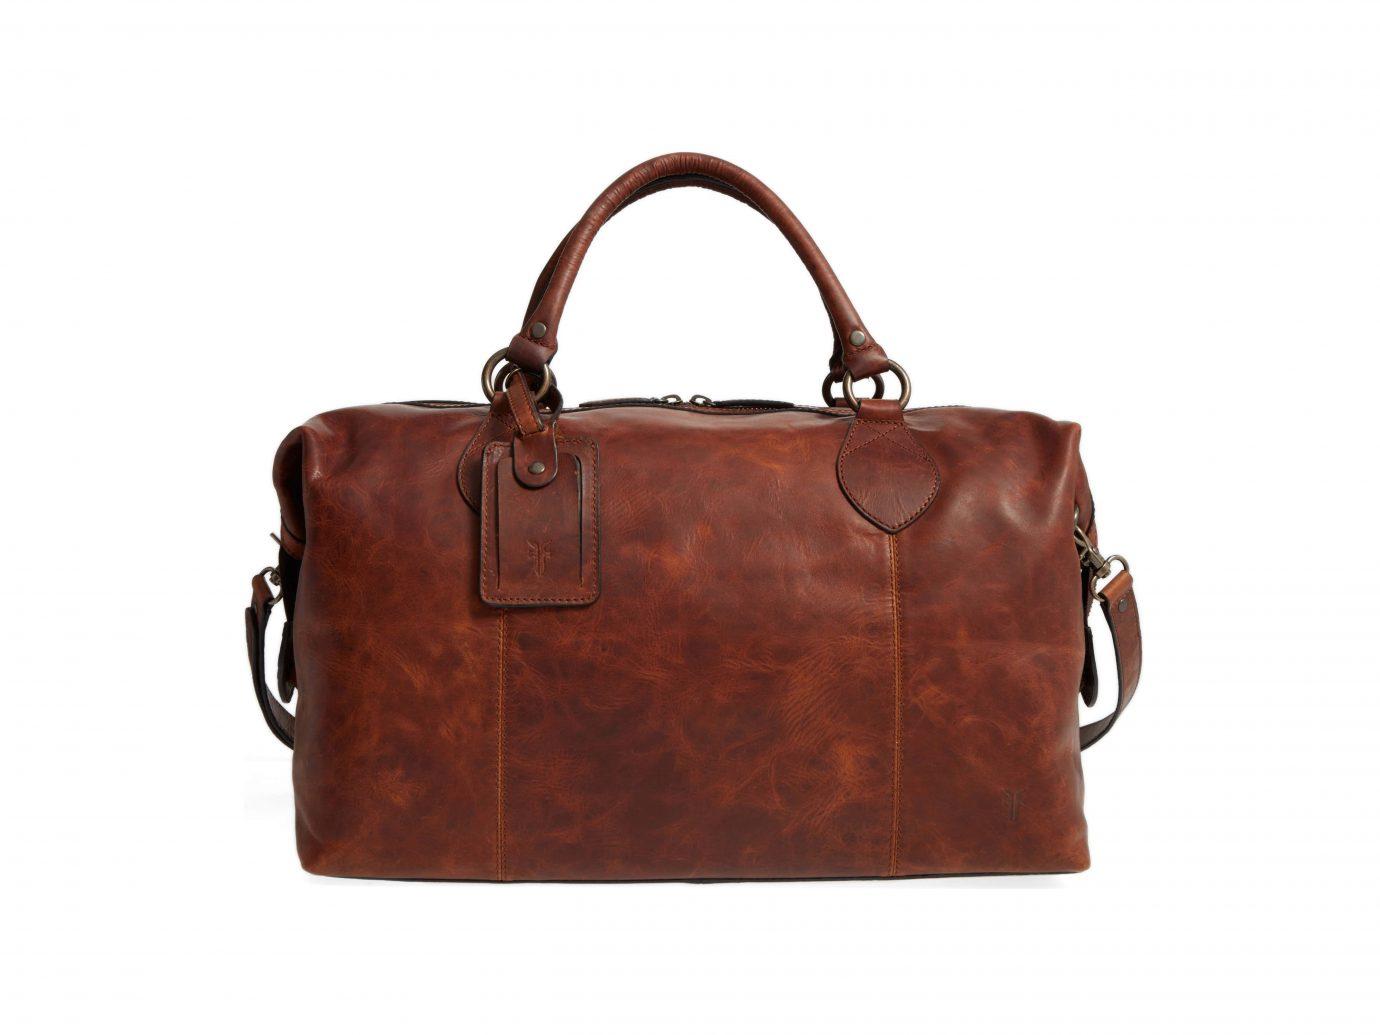 517017224cd2 The 13 Best Men s Weekend Duffel Bags